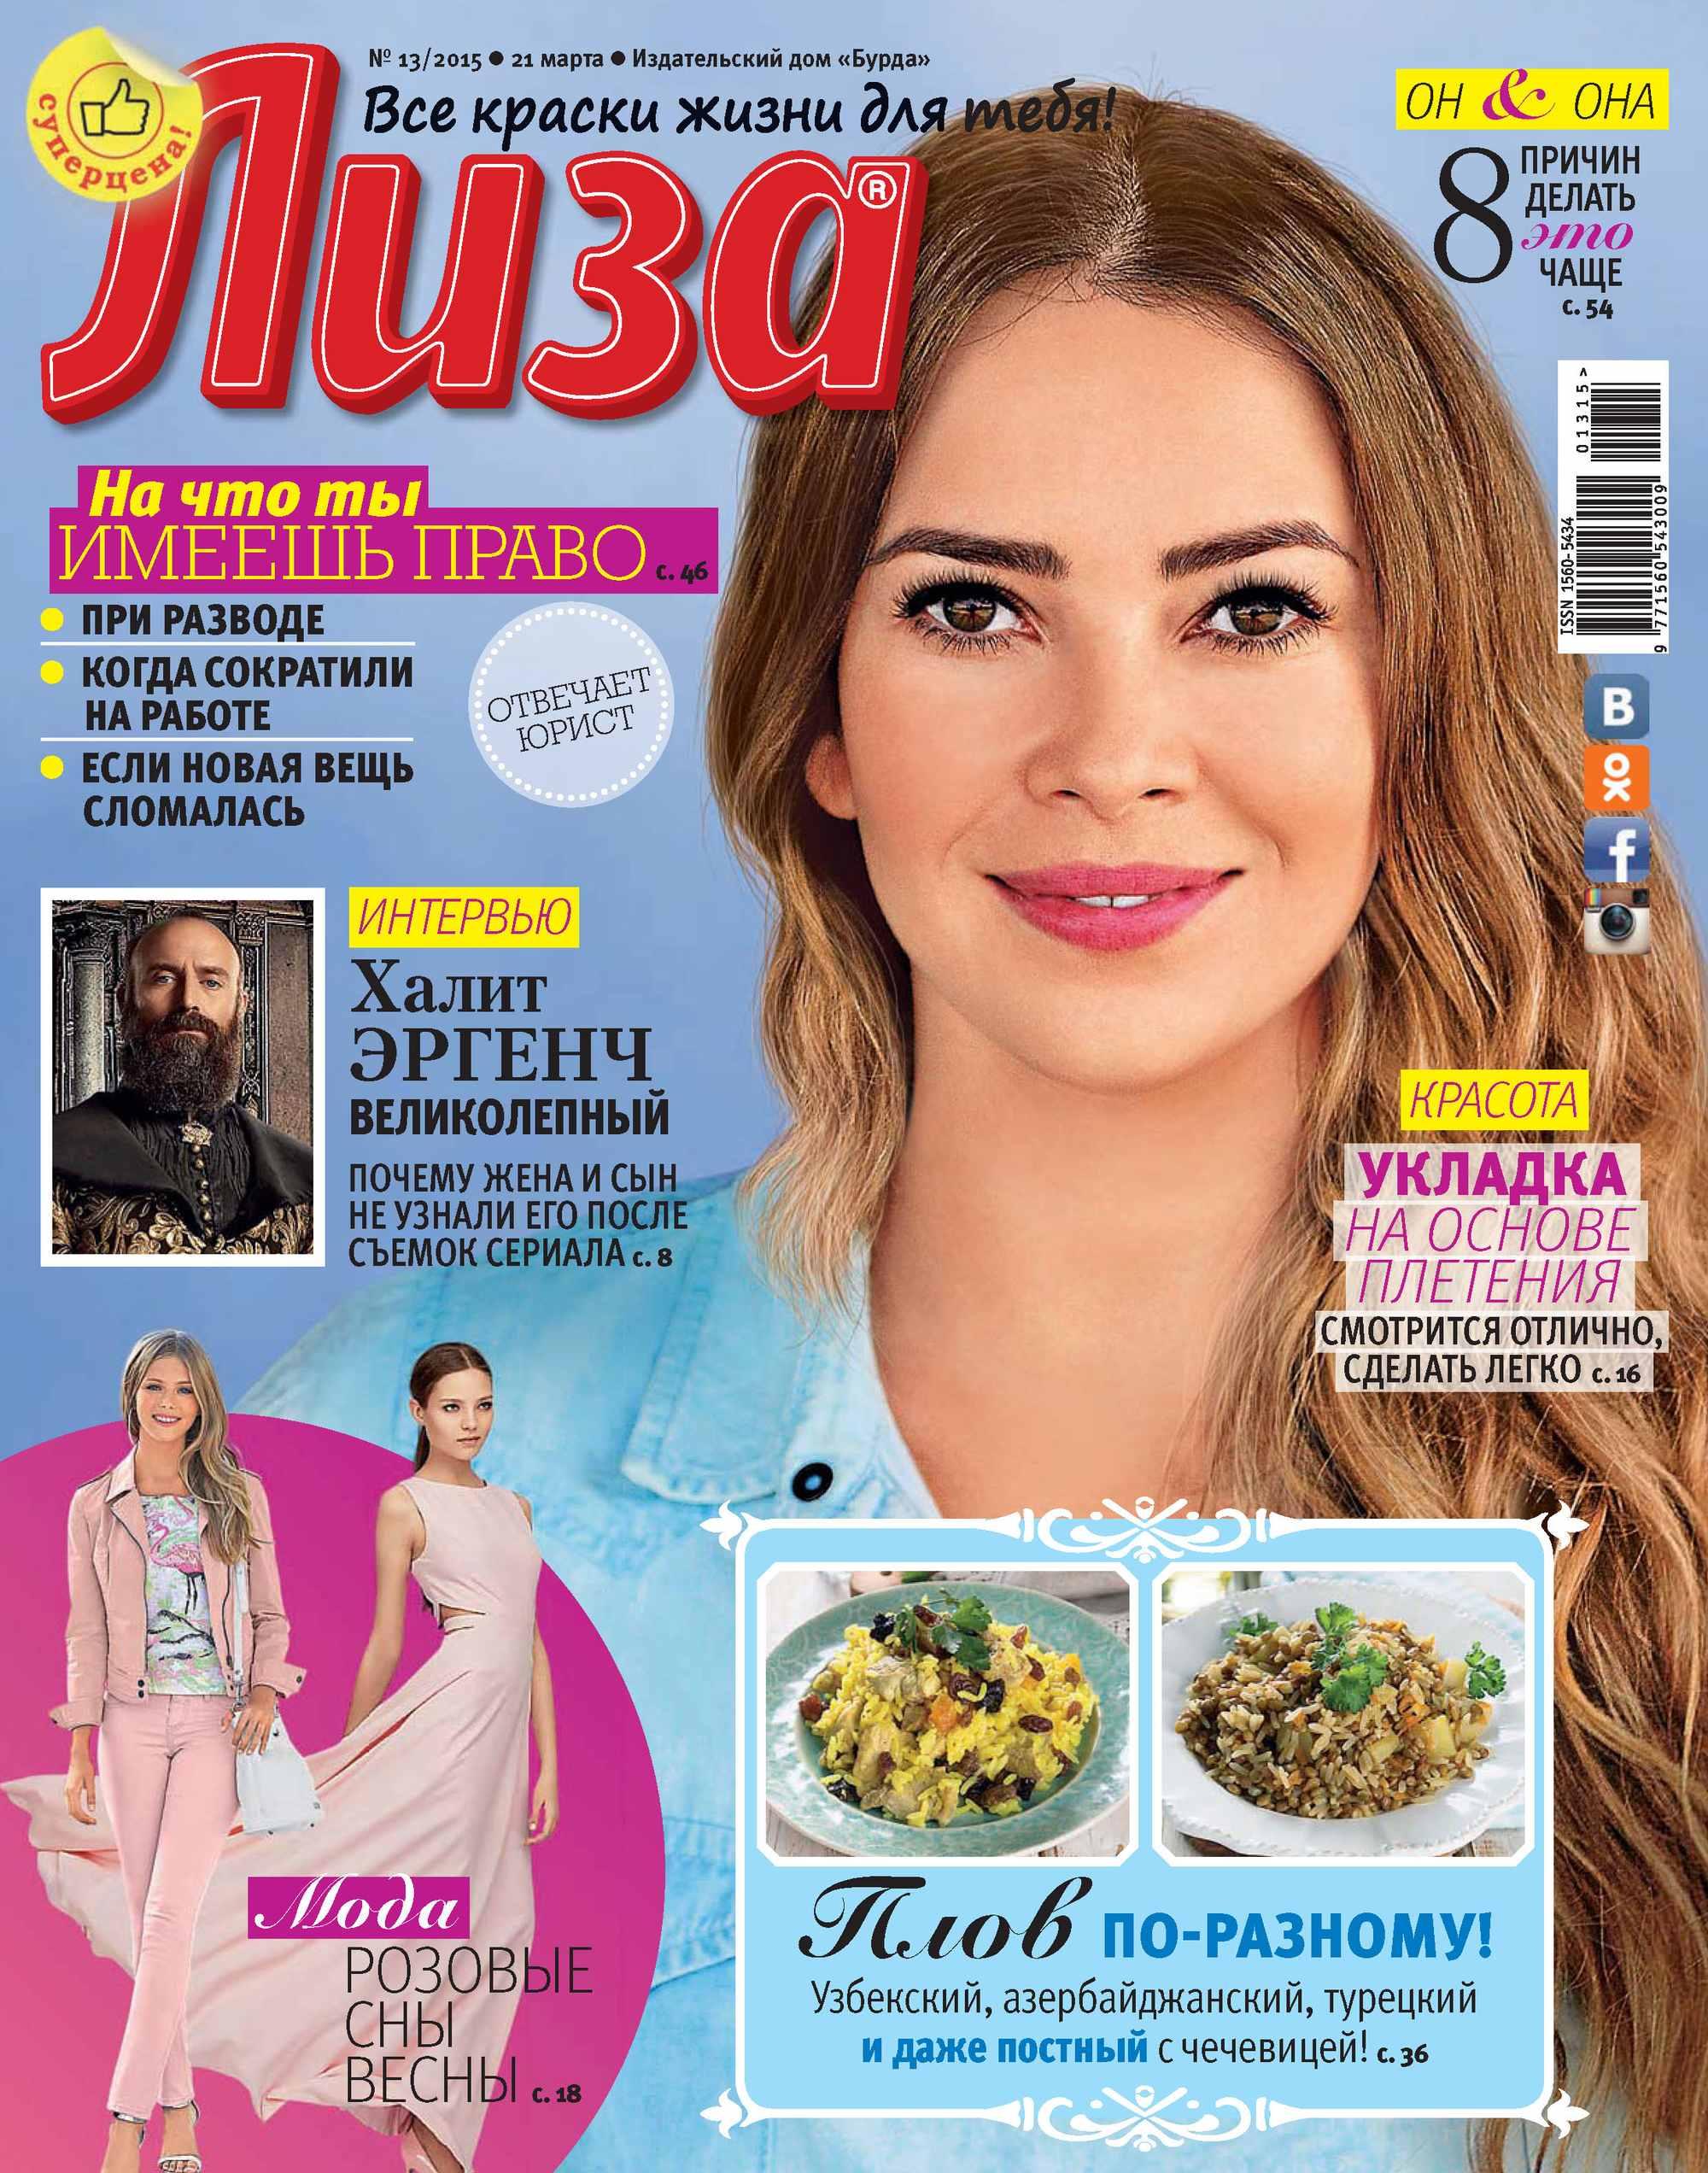 ИД «Бурда» Журнал «Лиза» №13/2015 ид бурда журнал лиза 13 2015